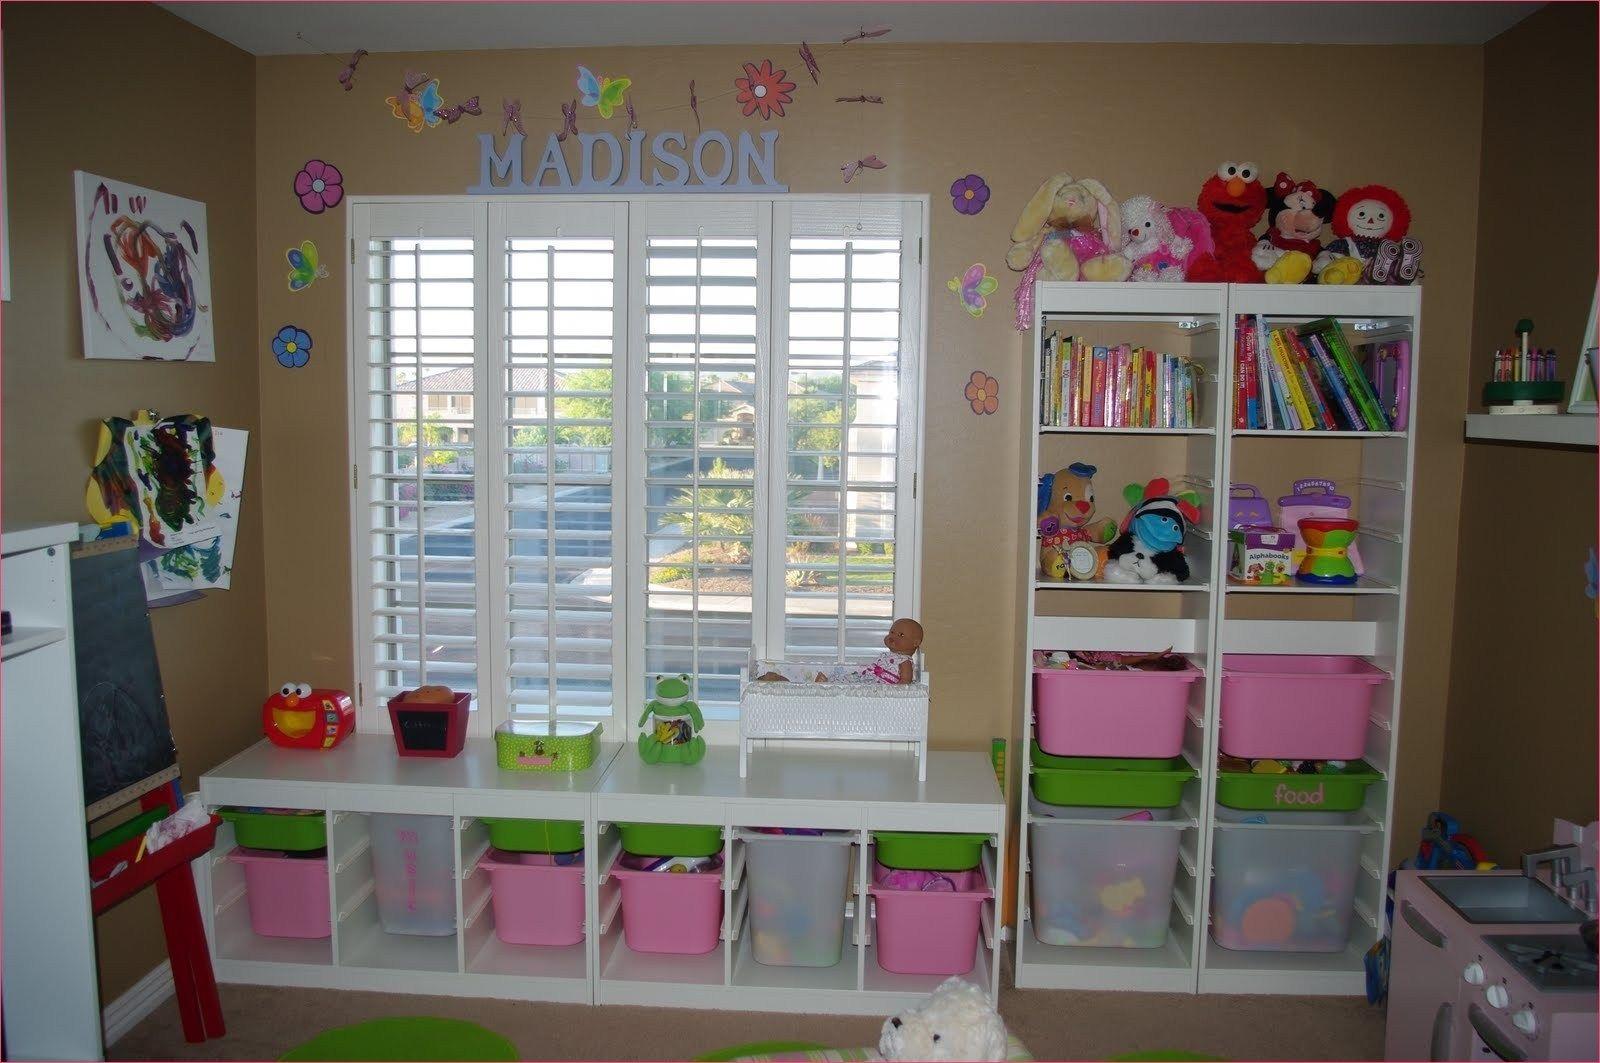 Cool Bedroom Toy Storage With Ikea Let S Diy Home Small Kids Room Storage Kids Room Small Bedroom Storage